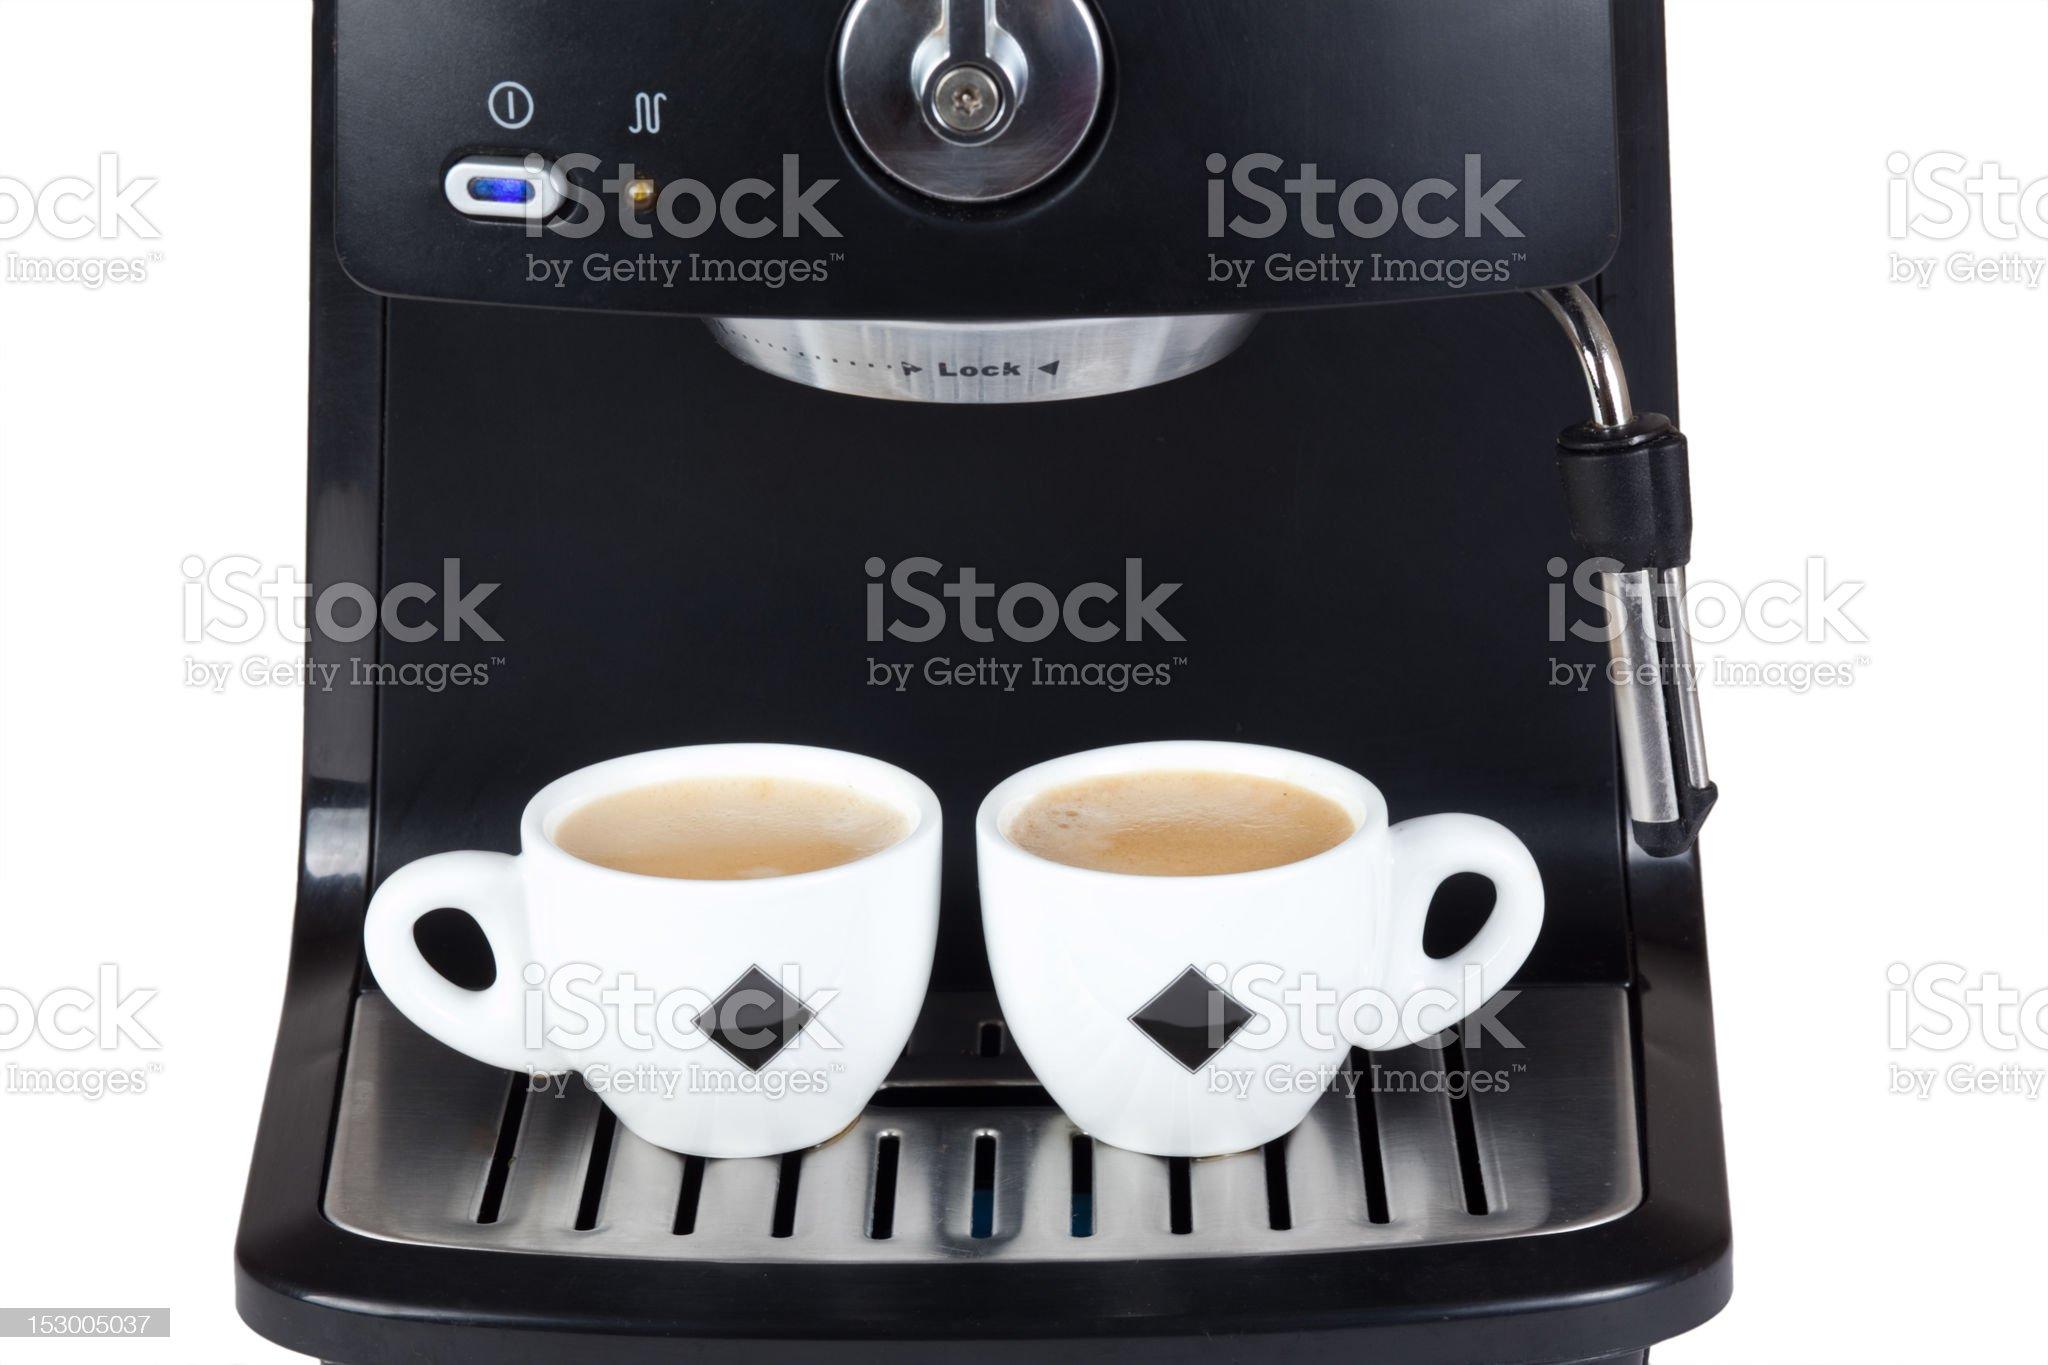 Espresso machine brewing a coffee royalty-free stock photo